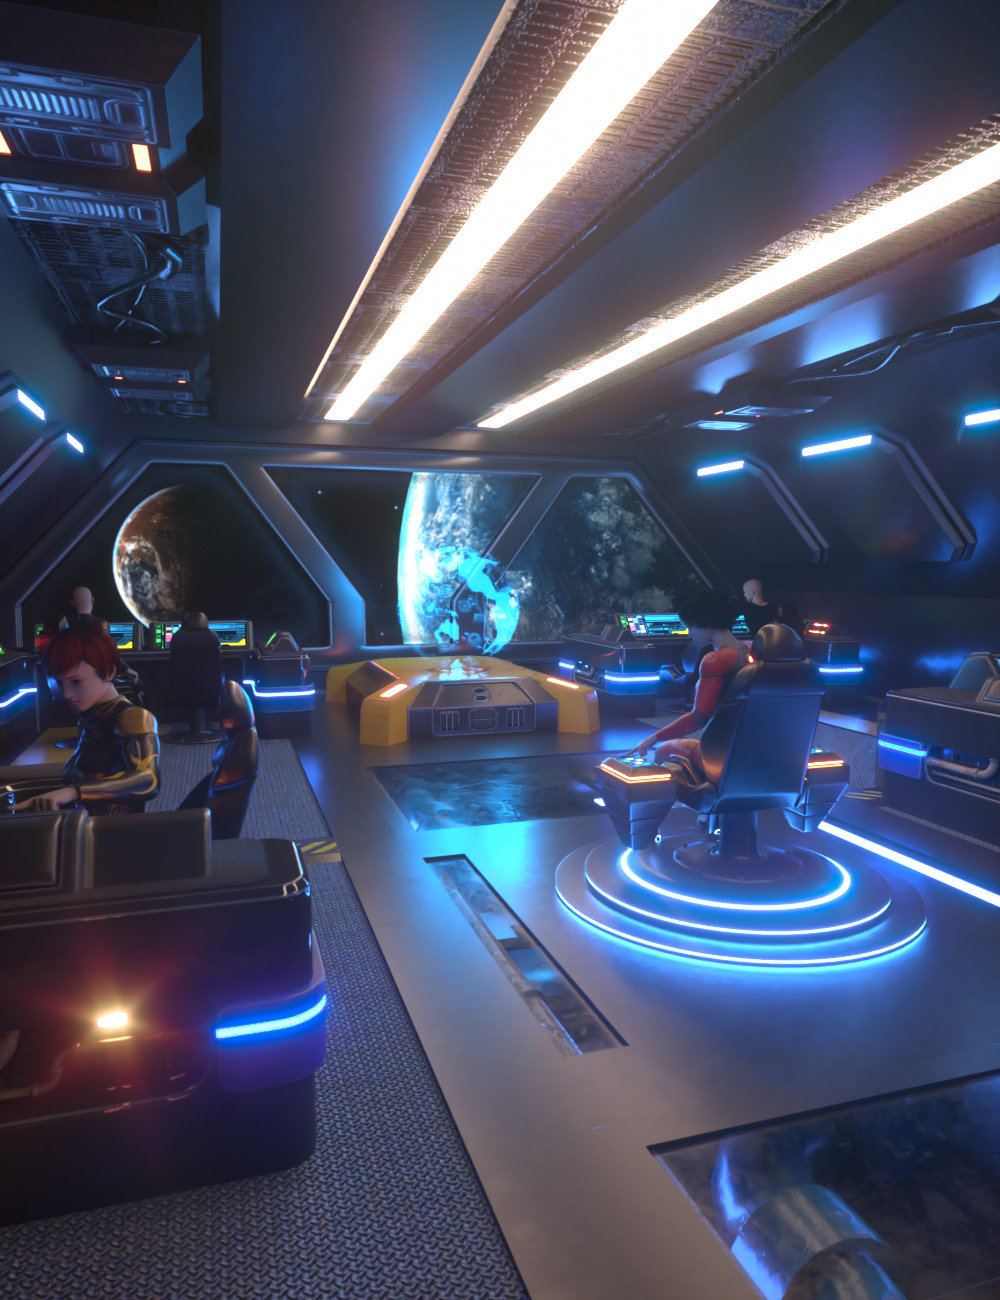 Sci-Fi Starship Bridge Volume 1 by: AcharyaPolina, 3D Models by Daz 3D